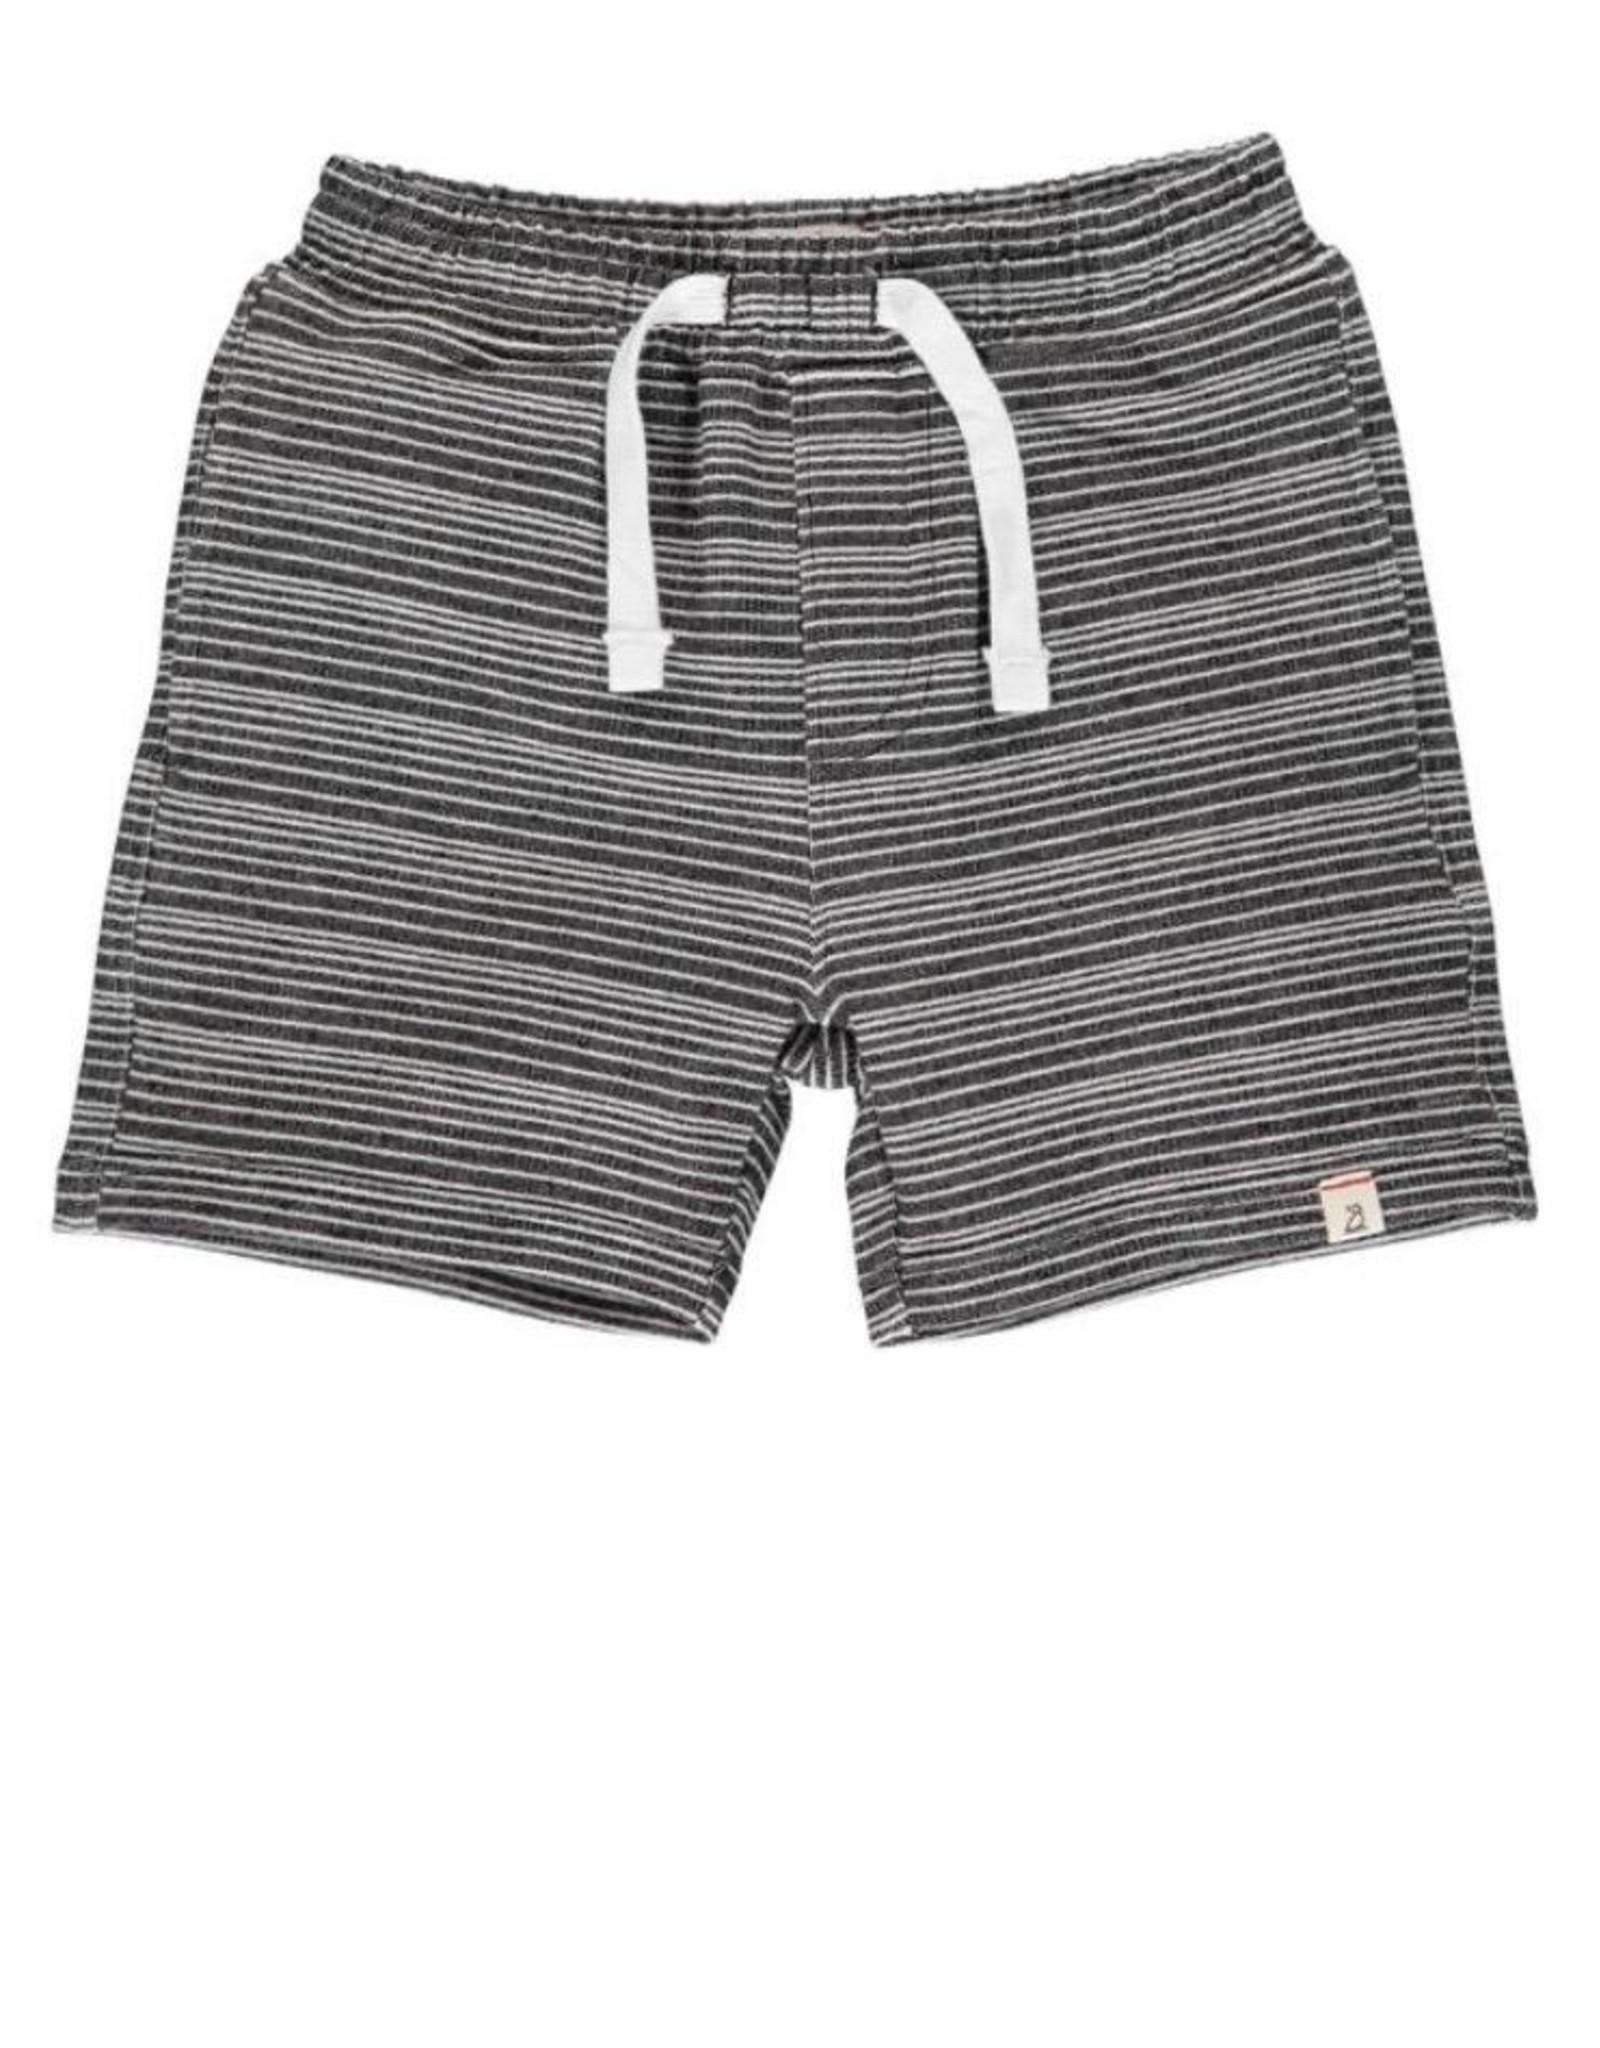 Me & Henry Surf, Black & White Stripe Sweat Shorts